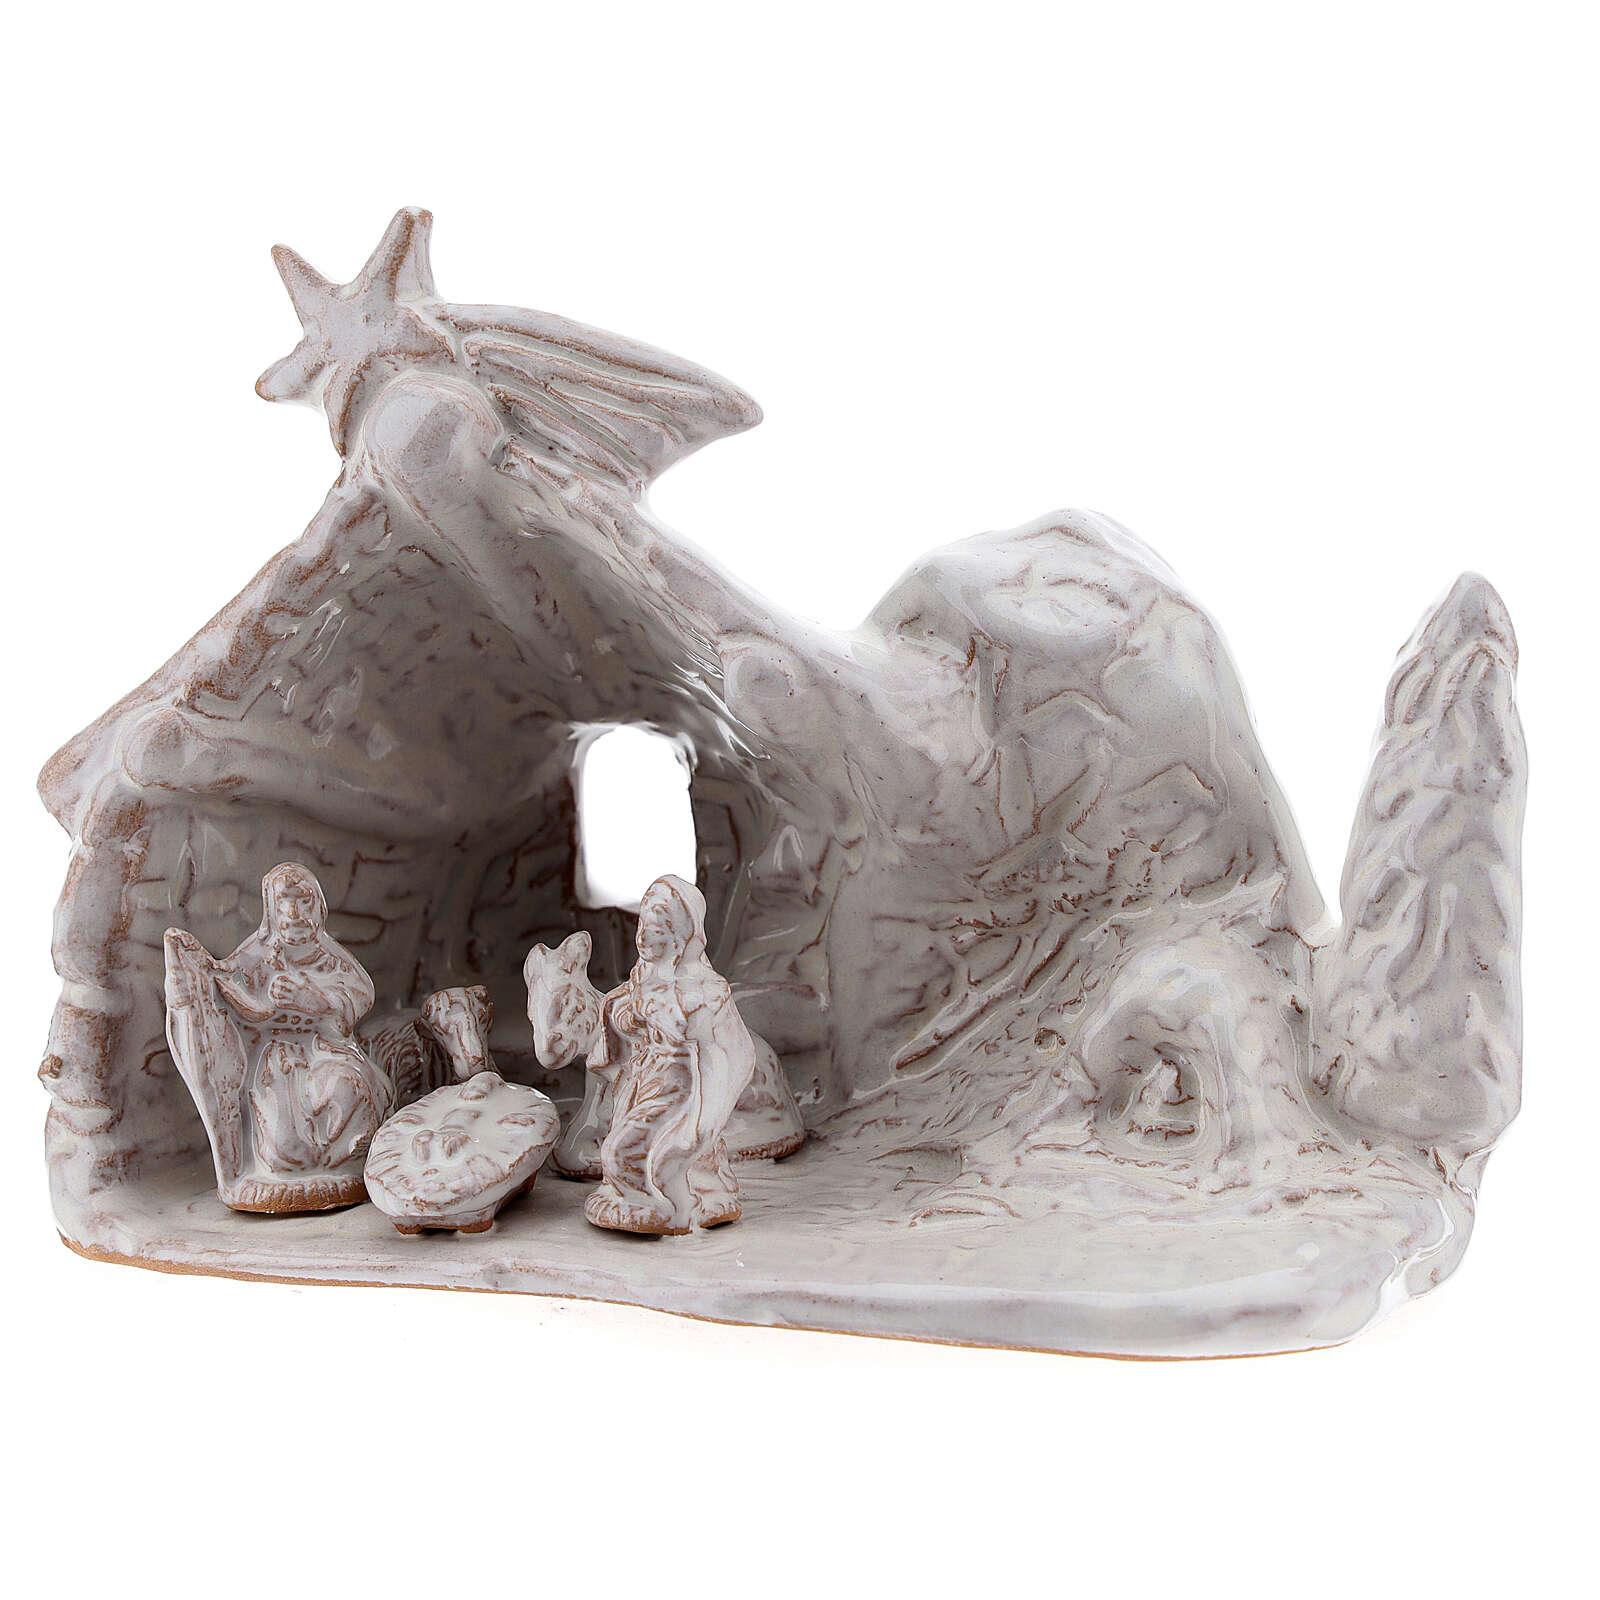 Cabaña pequeña con árbol natividad terracota blanca Deruta 10 cm 4